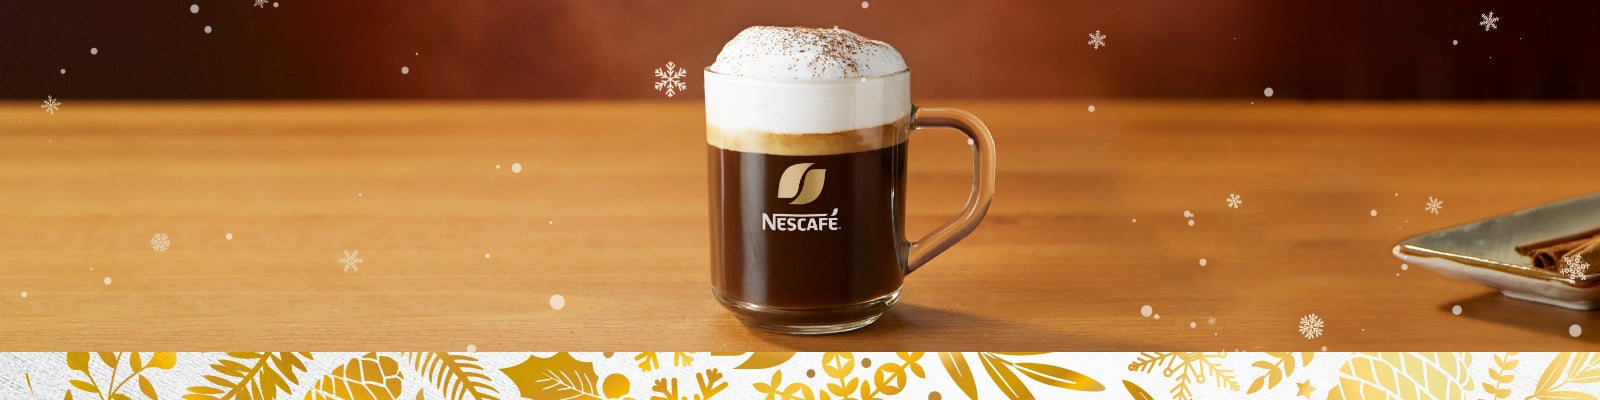 Festive-Smoked-Cinnamon-Coffee